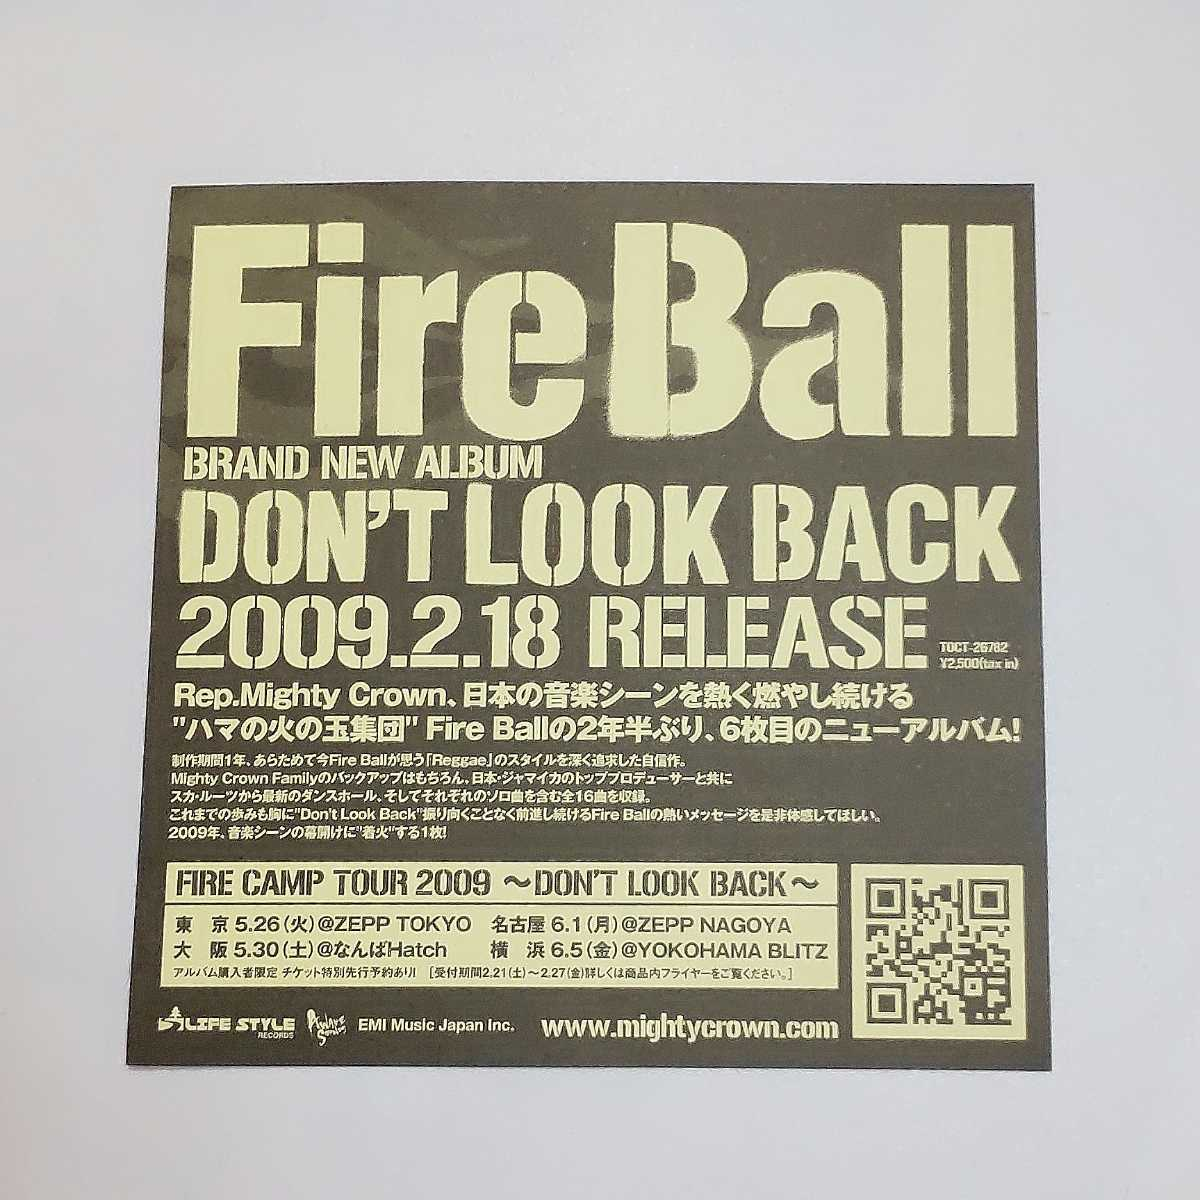 FireBall DON'T LOOK BACK ステッカー★検)ノベルティー シール 非売品 販促品 デッドストック 当時物 REGGAE レゲエ ジャパレゲ_画像2